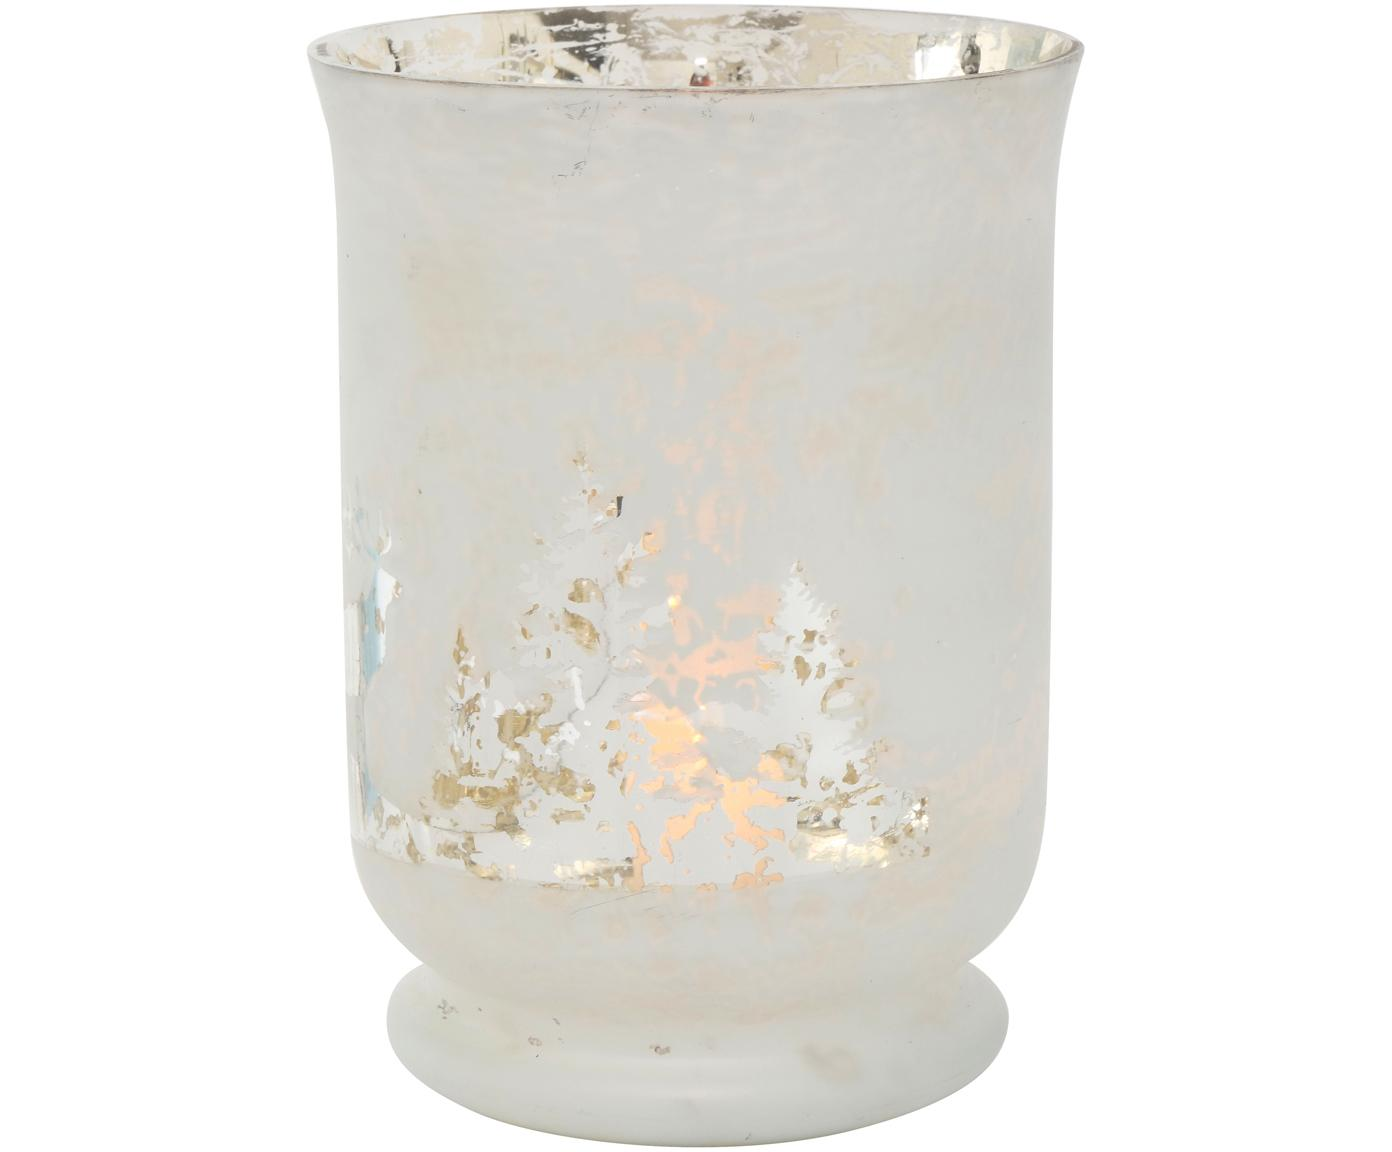 Windlicht Bonaparte, Gelakt glas, Houder: mat wit. Pompje: zilverkleurig, Ø 14 cm